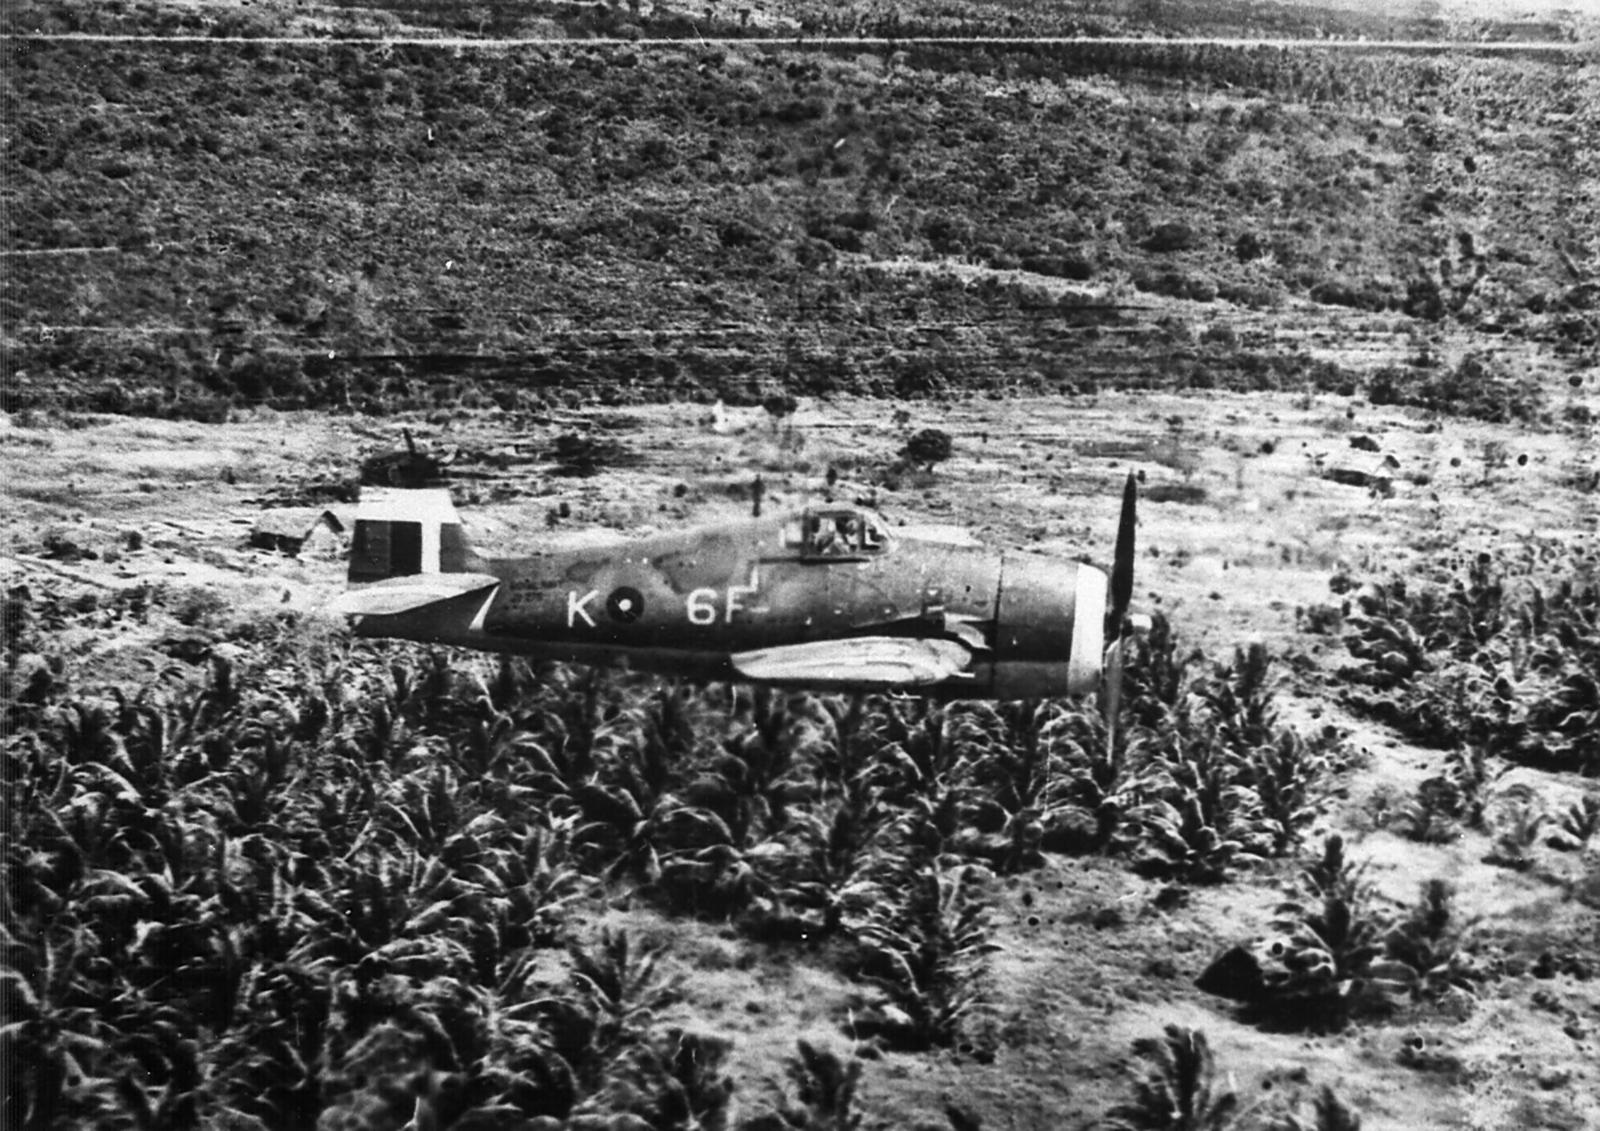 Grumman Hellcat MkII RN FAA 808NAS K6F on patrol over Katukurunda 1945 01